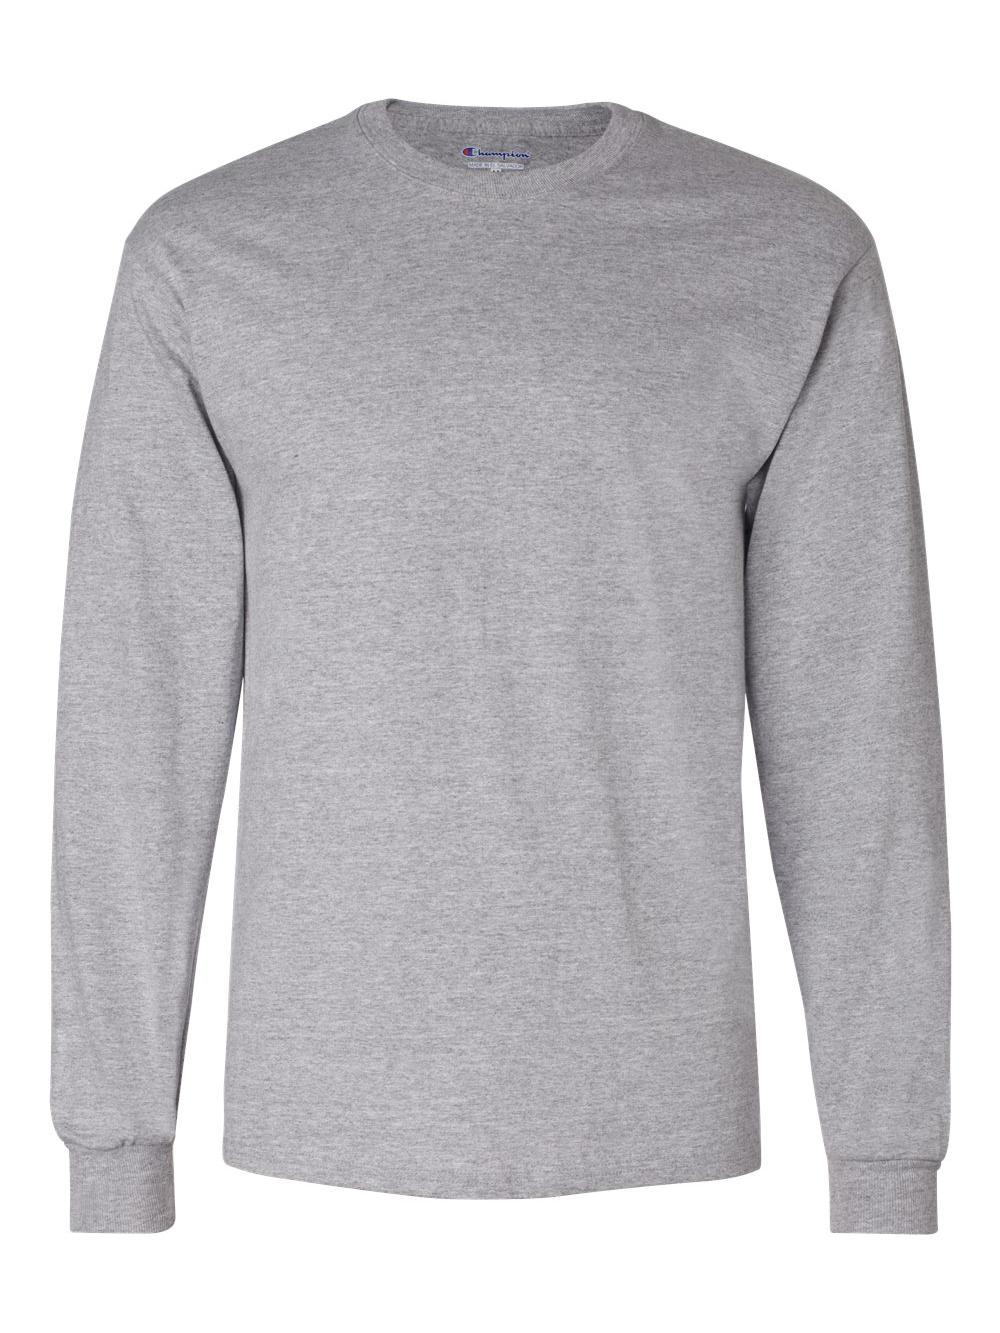 318c4690 Champion Men S Blank Long Sleeve Tagless Crewneck T-shirt Cc8c S-2xl ...